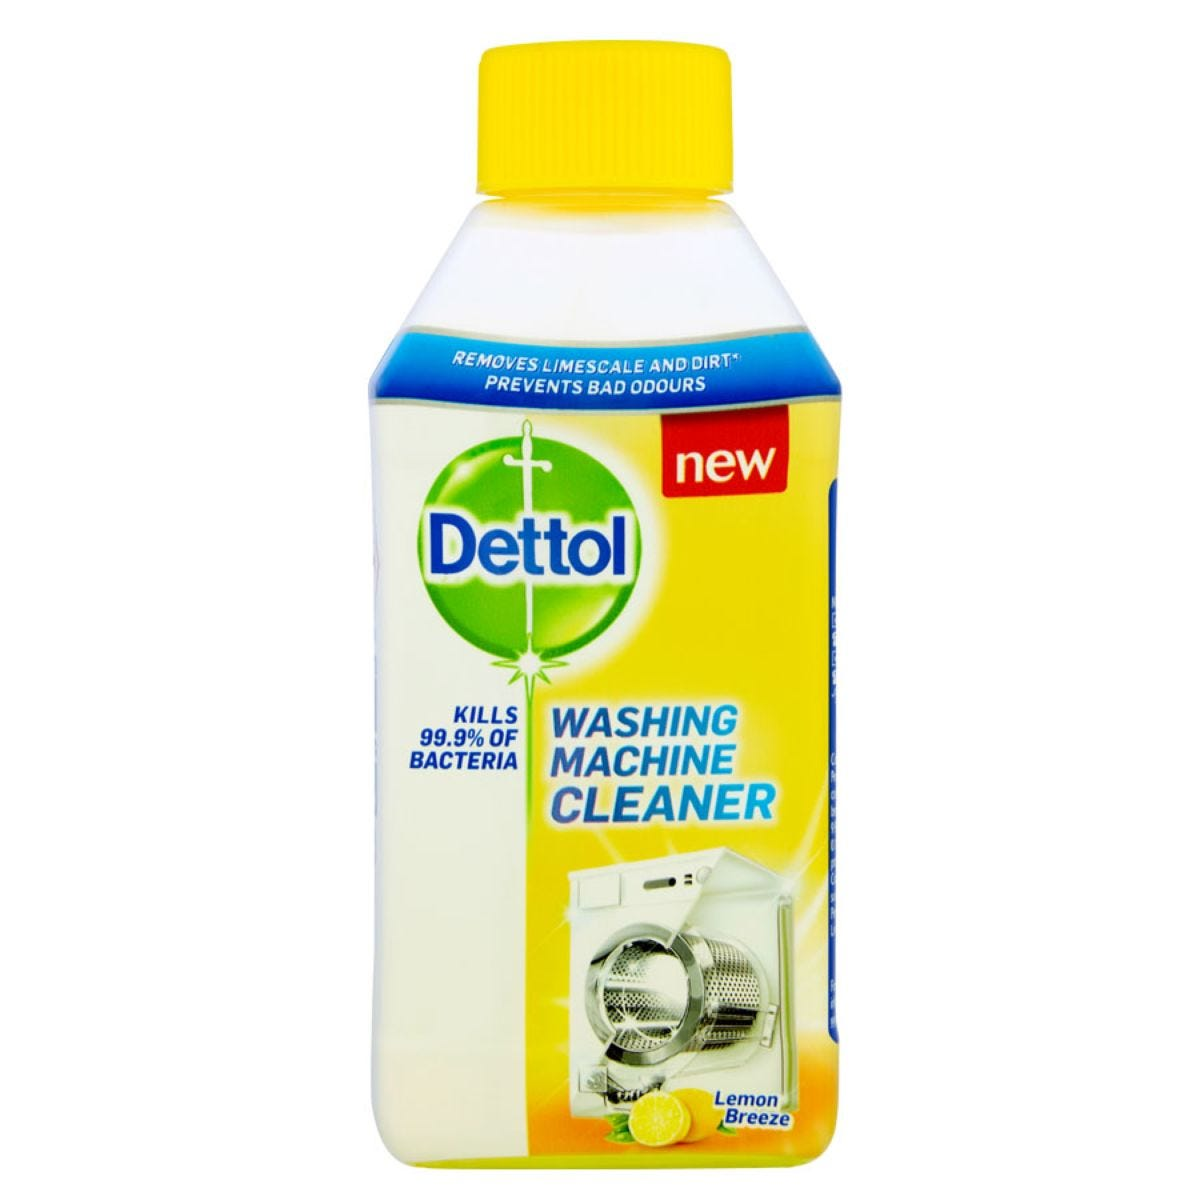 Dettol Washing Machine Cleaner – Lemon